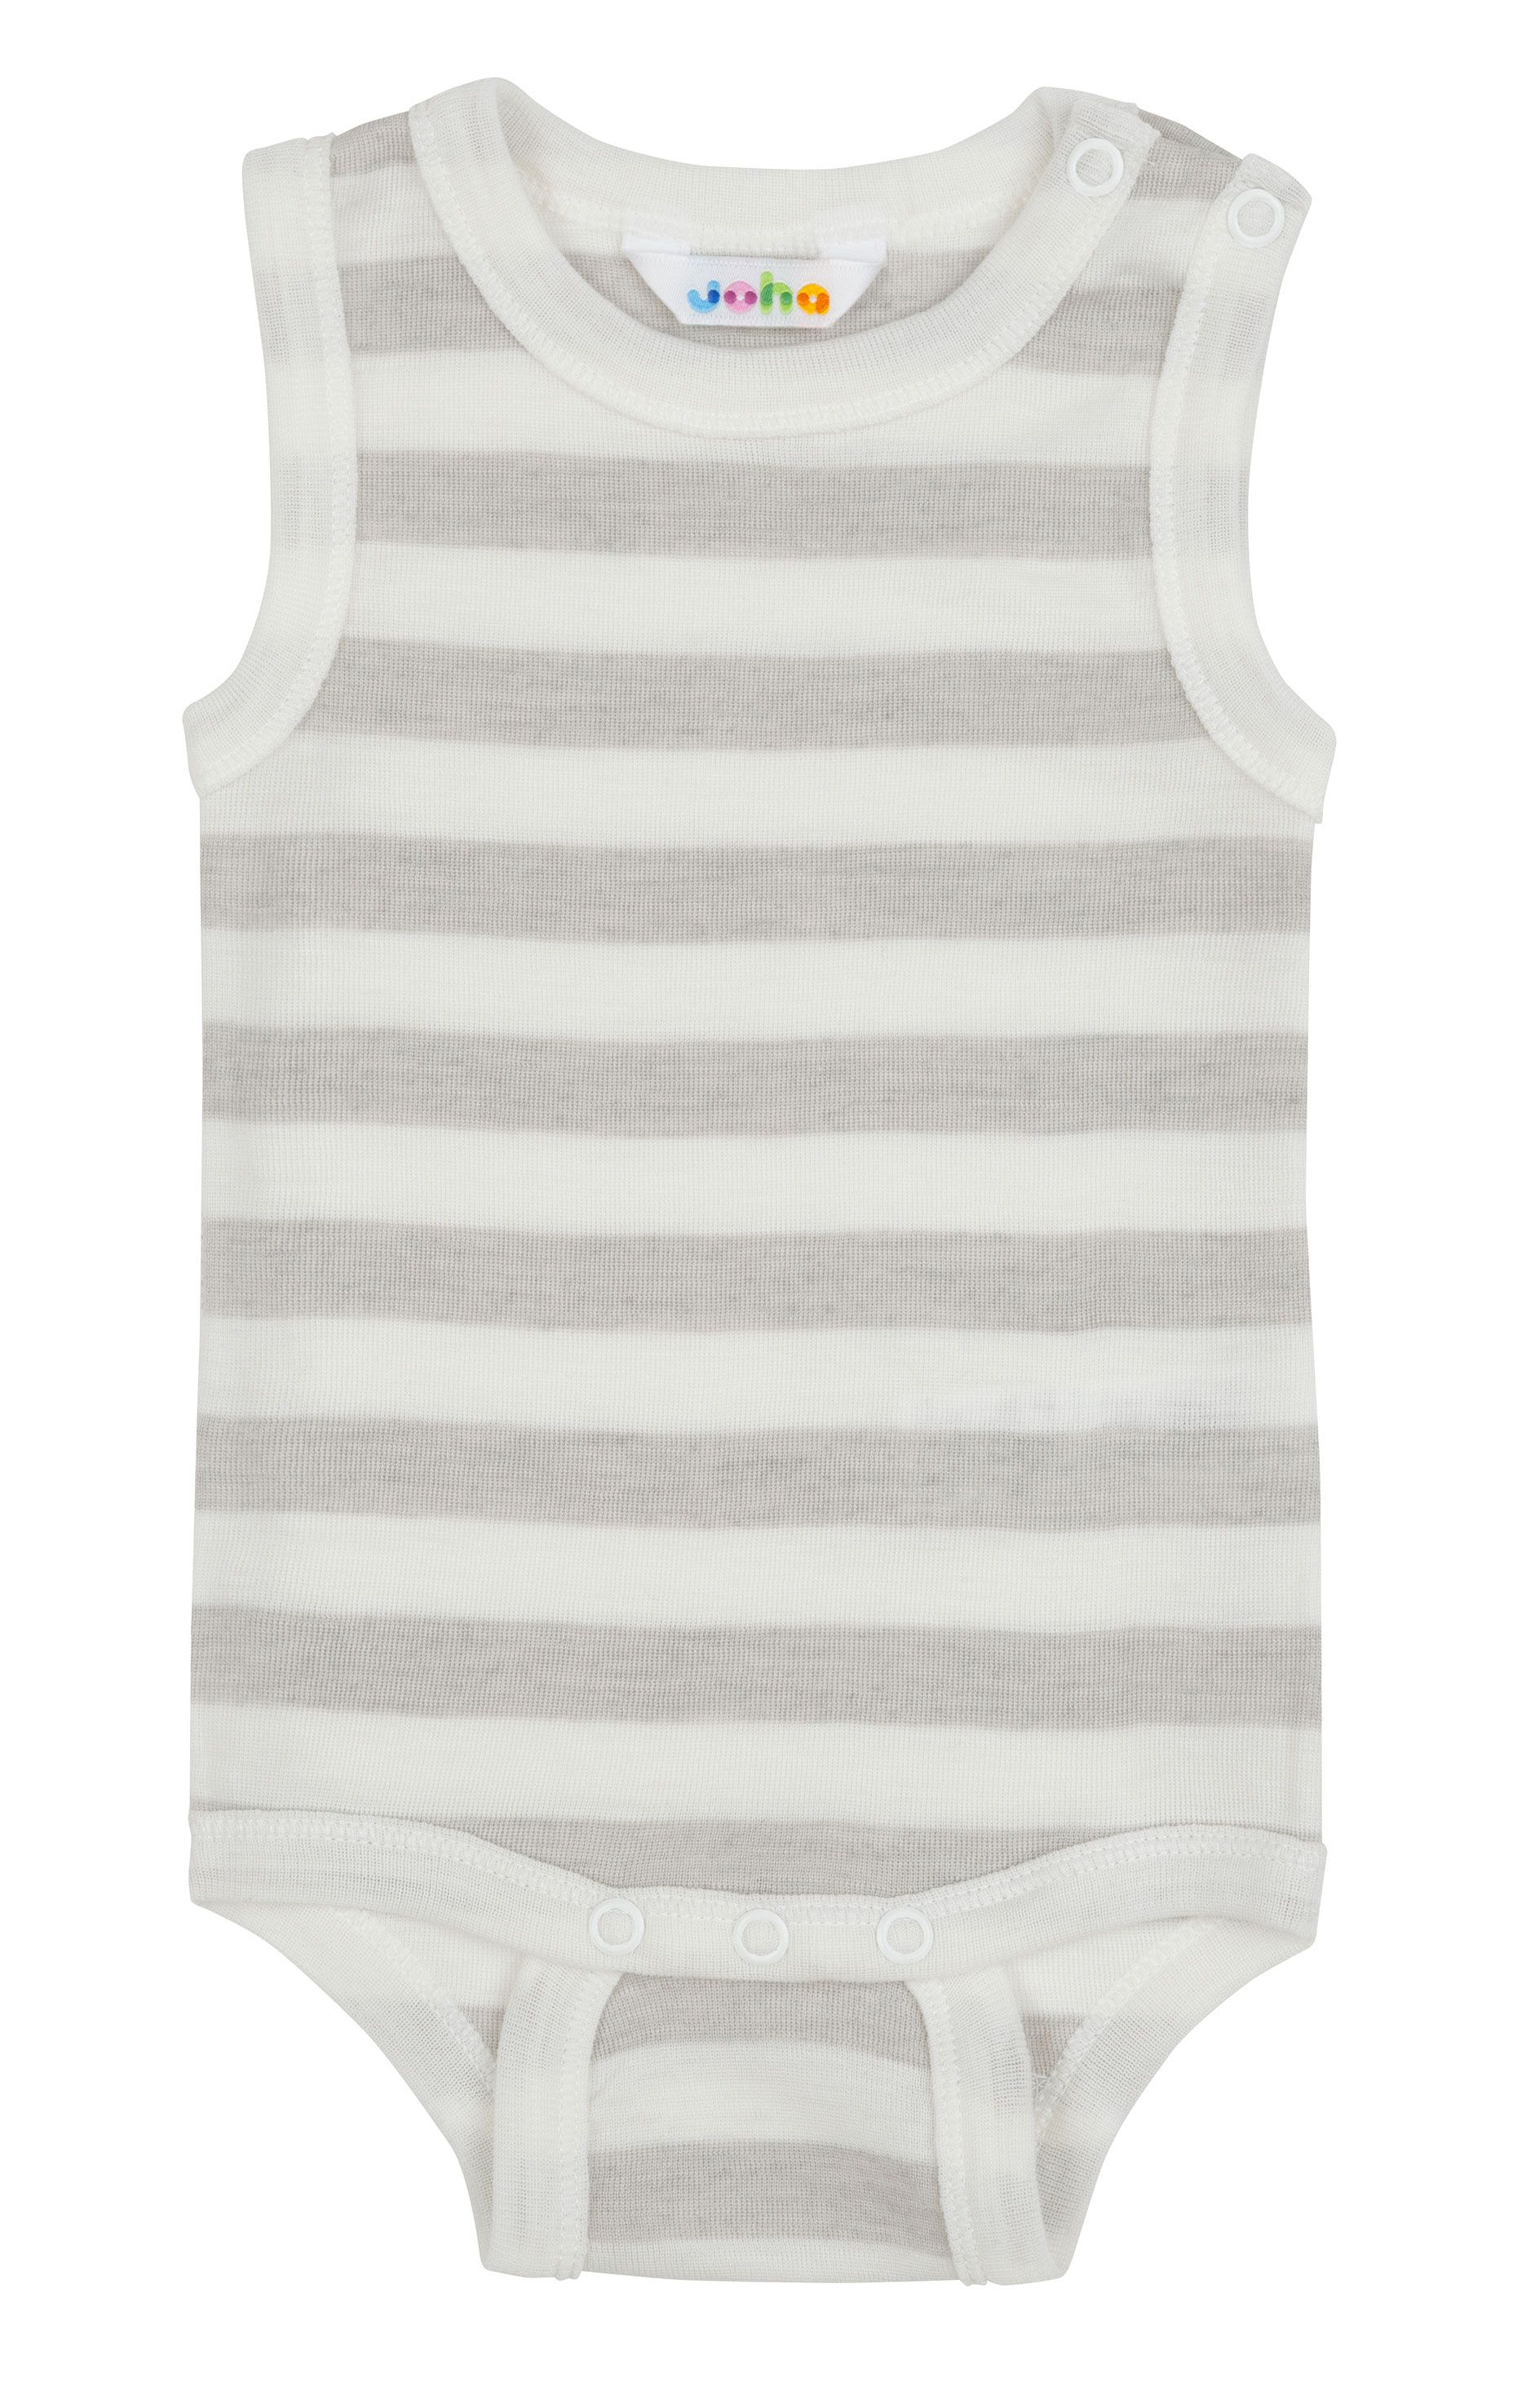 Image of   Body uden ærmer fra Joha i uld-silke m. White-grey stripe